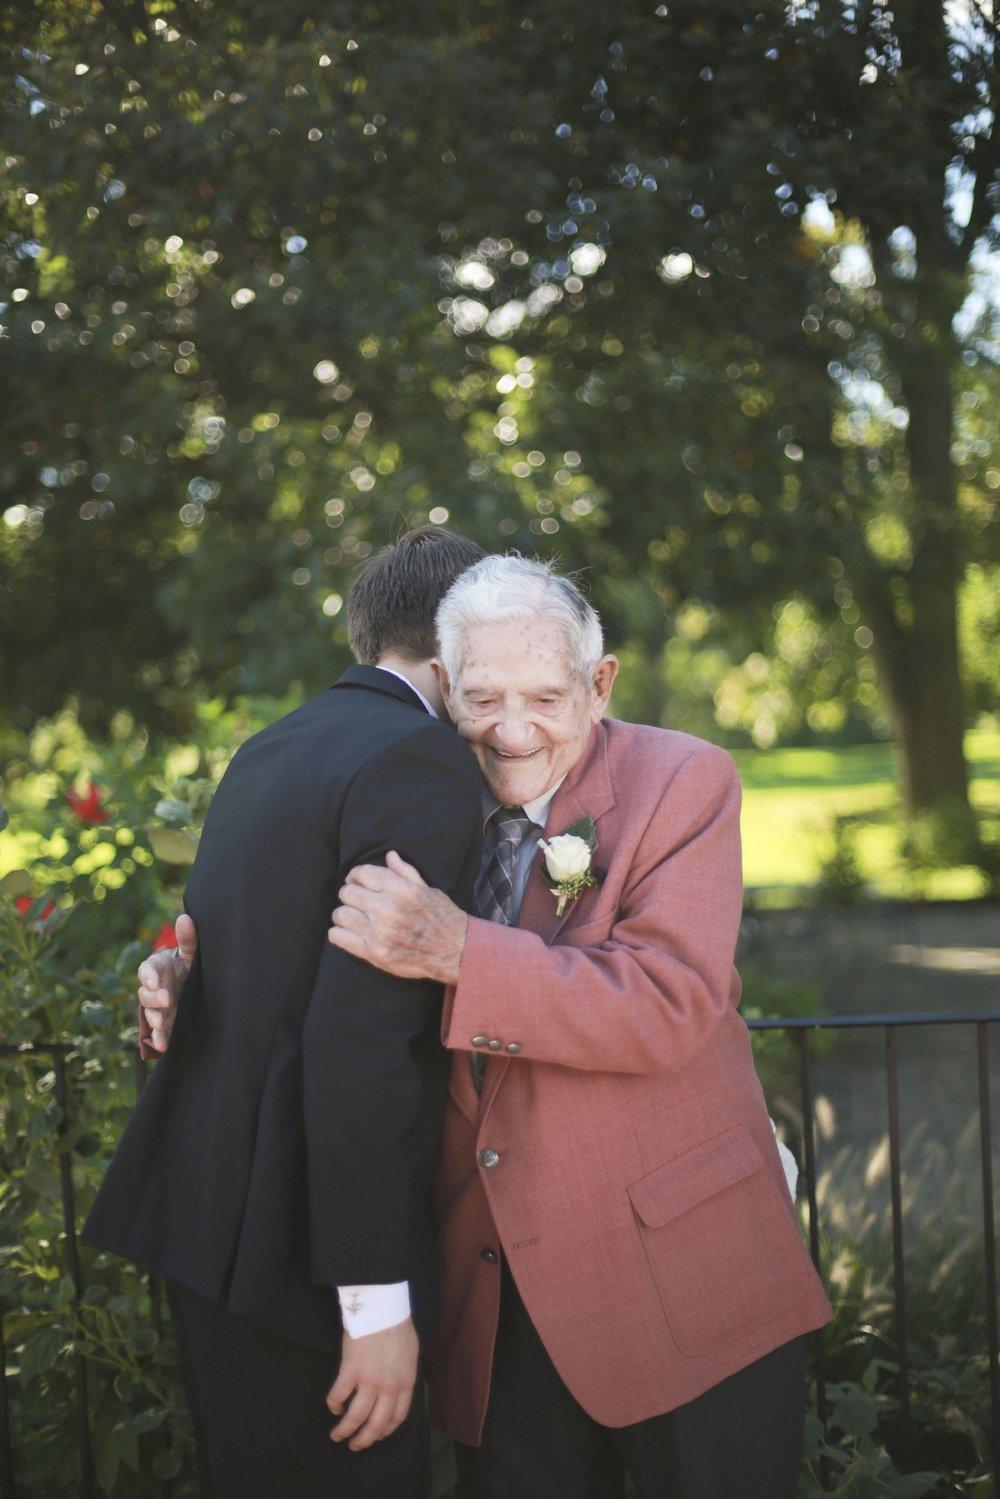 grandpa shot.jpg